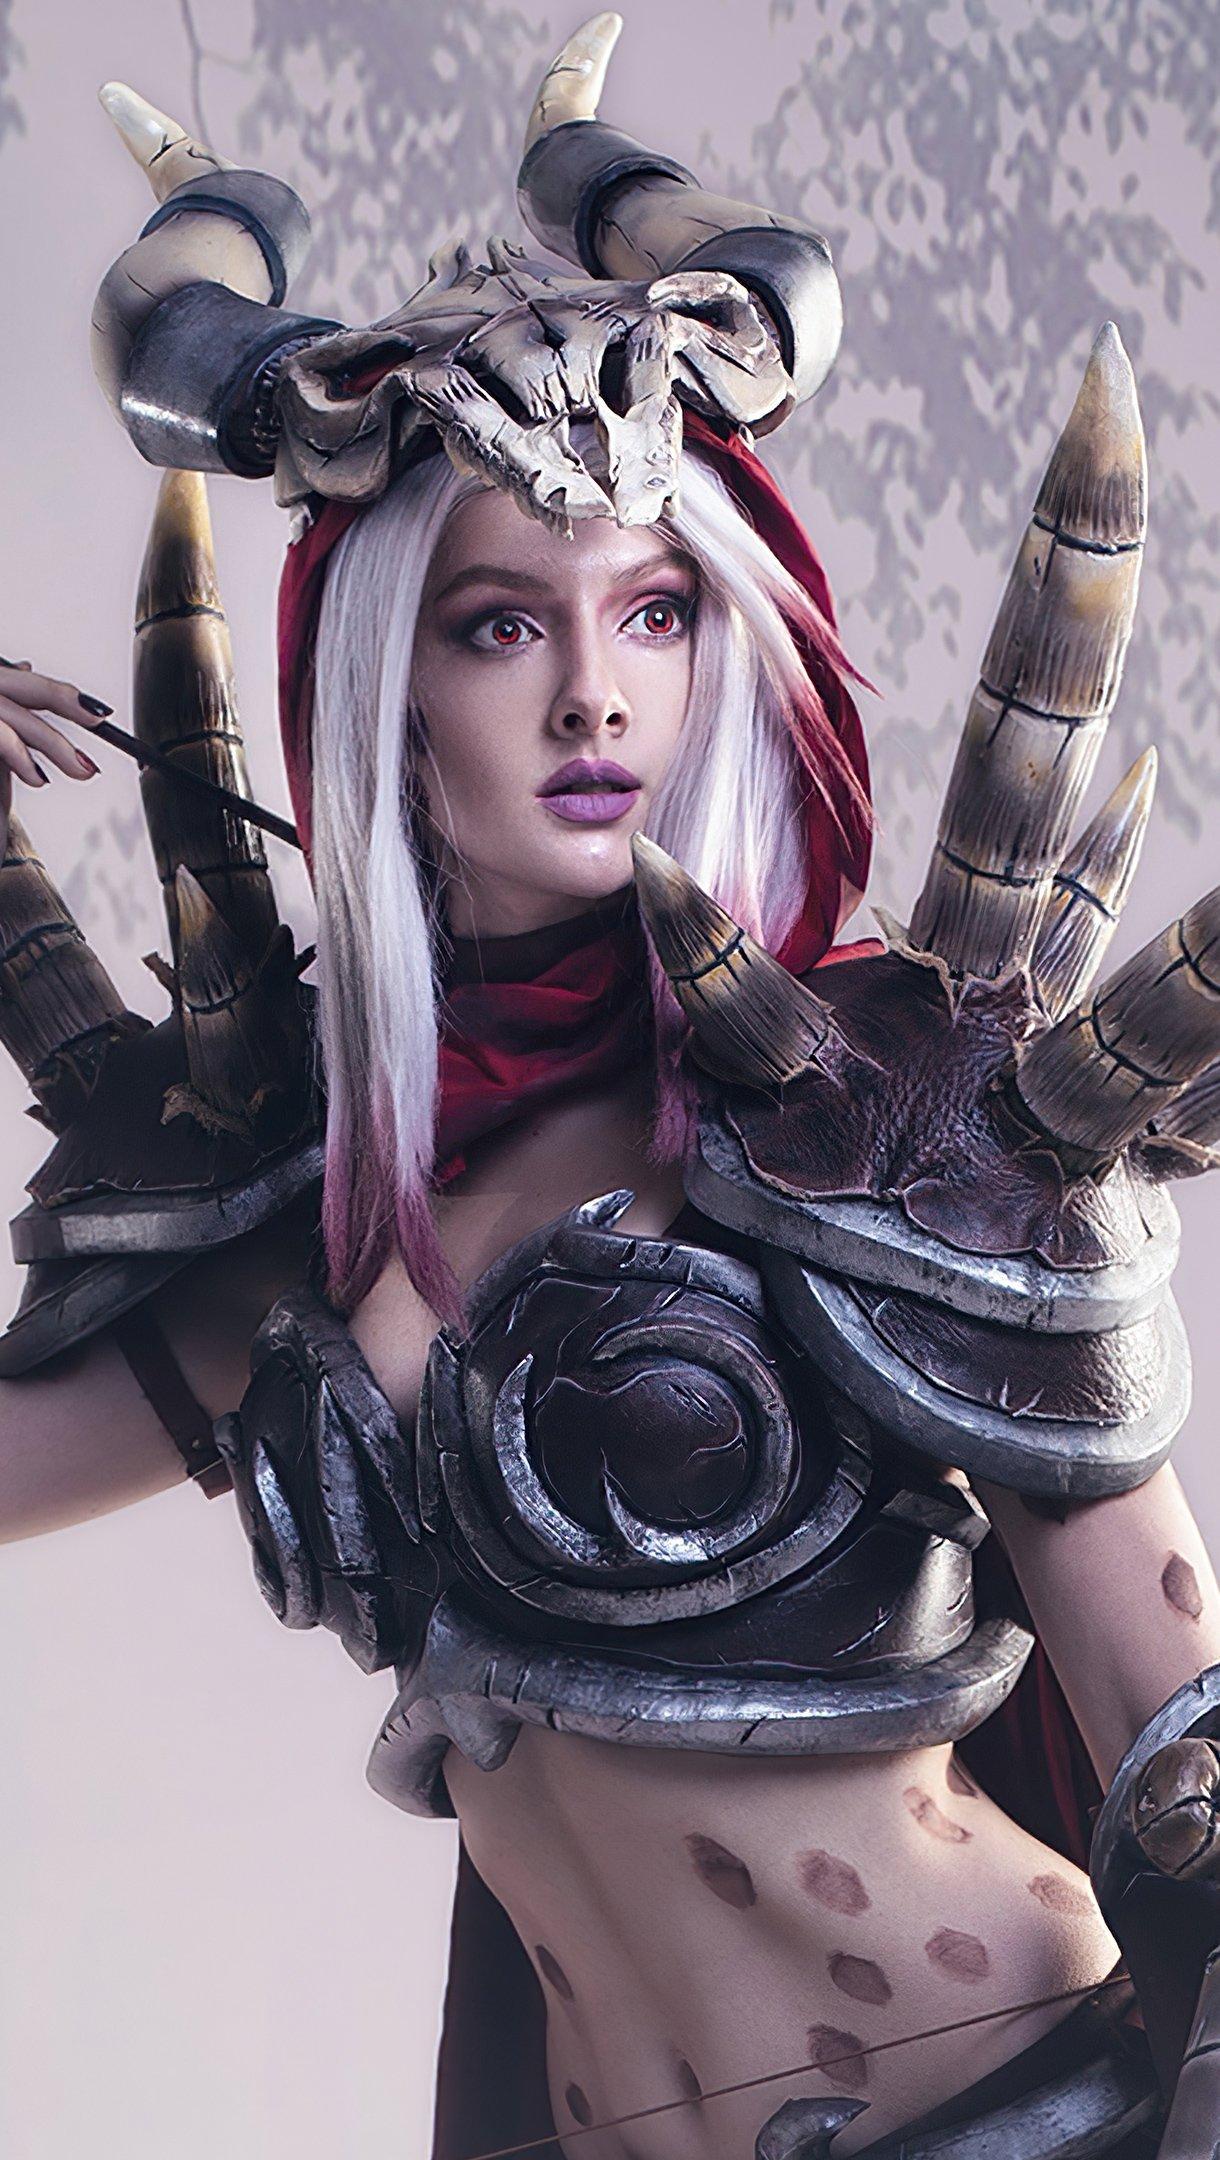 Fondos de pantalla Sylvanas Windrunner de Warcraft Vertical